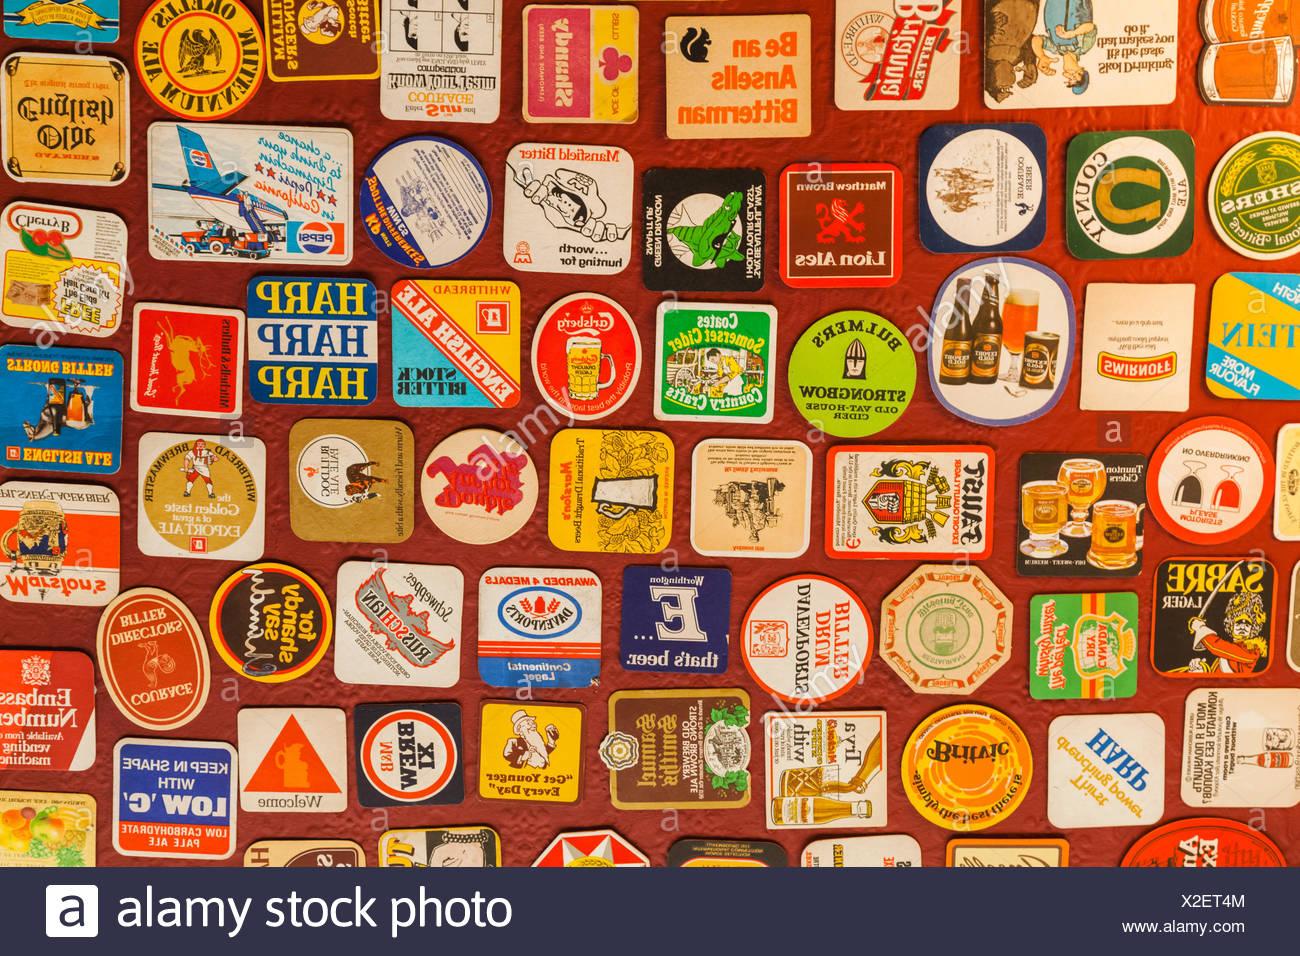 England, London, Pub Beer Mat Decoration Stock Photo